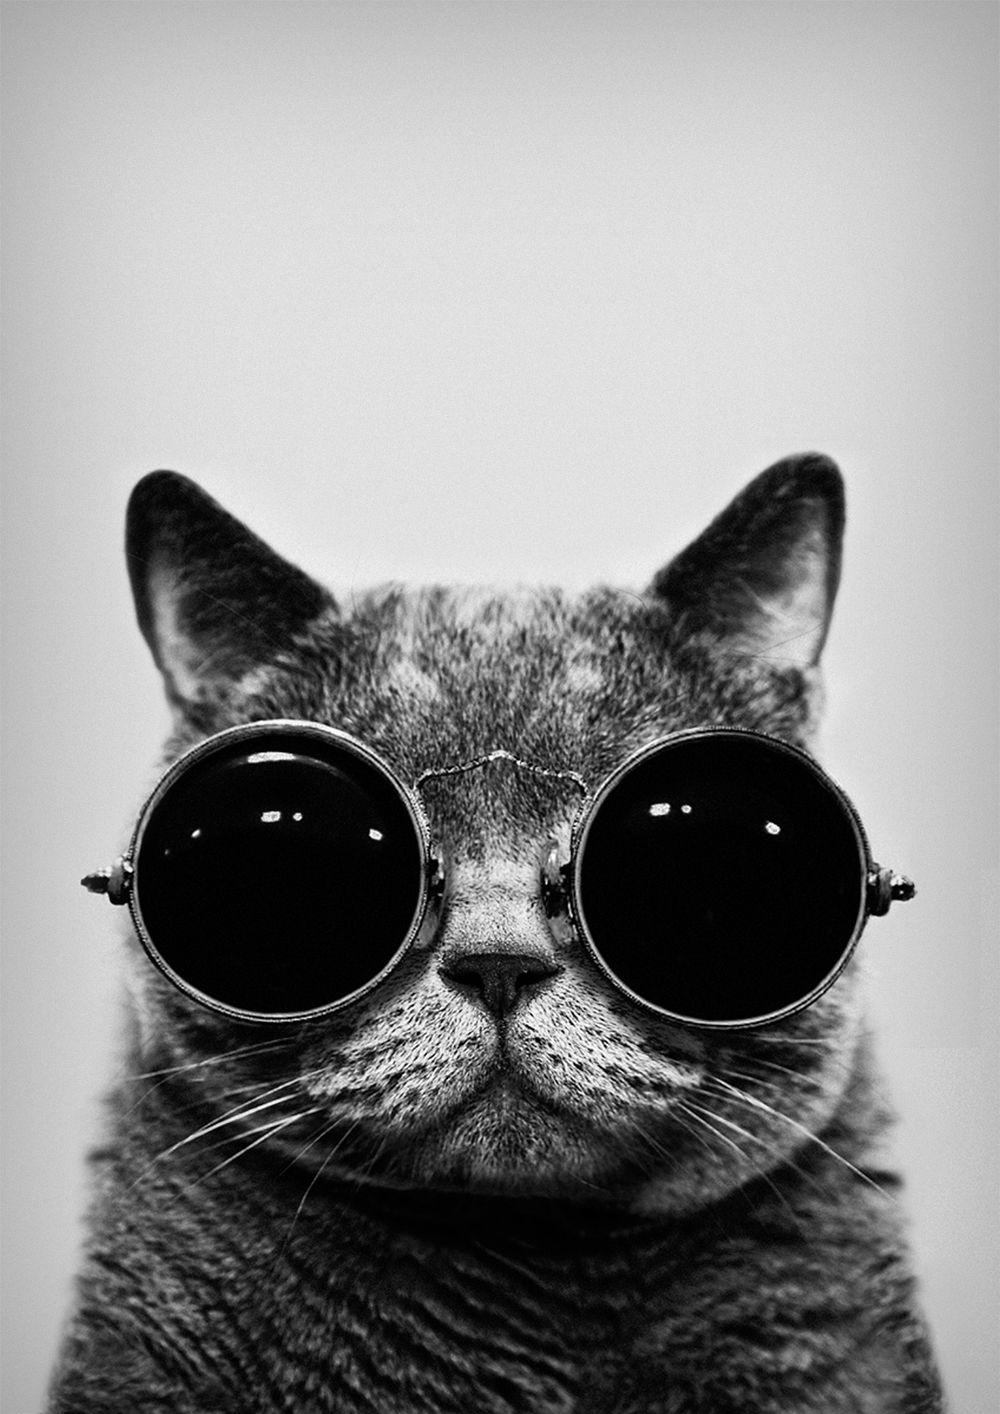 Black White Iphone Wallpaper Tumblr Grunge Cat Hipster Phone